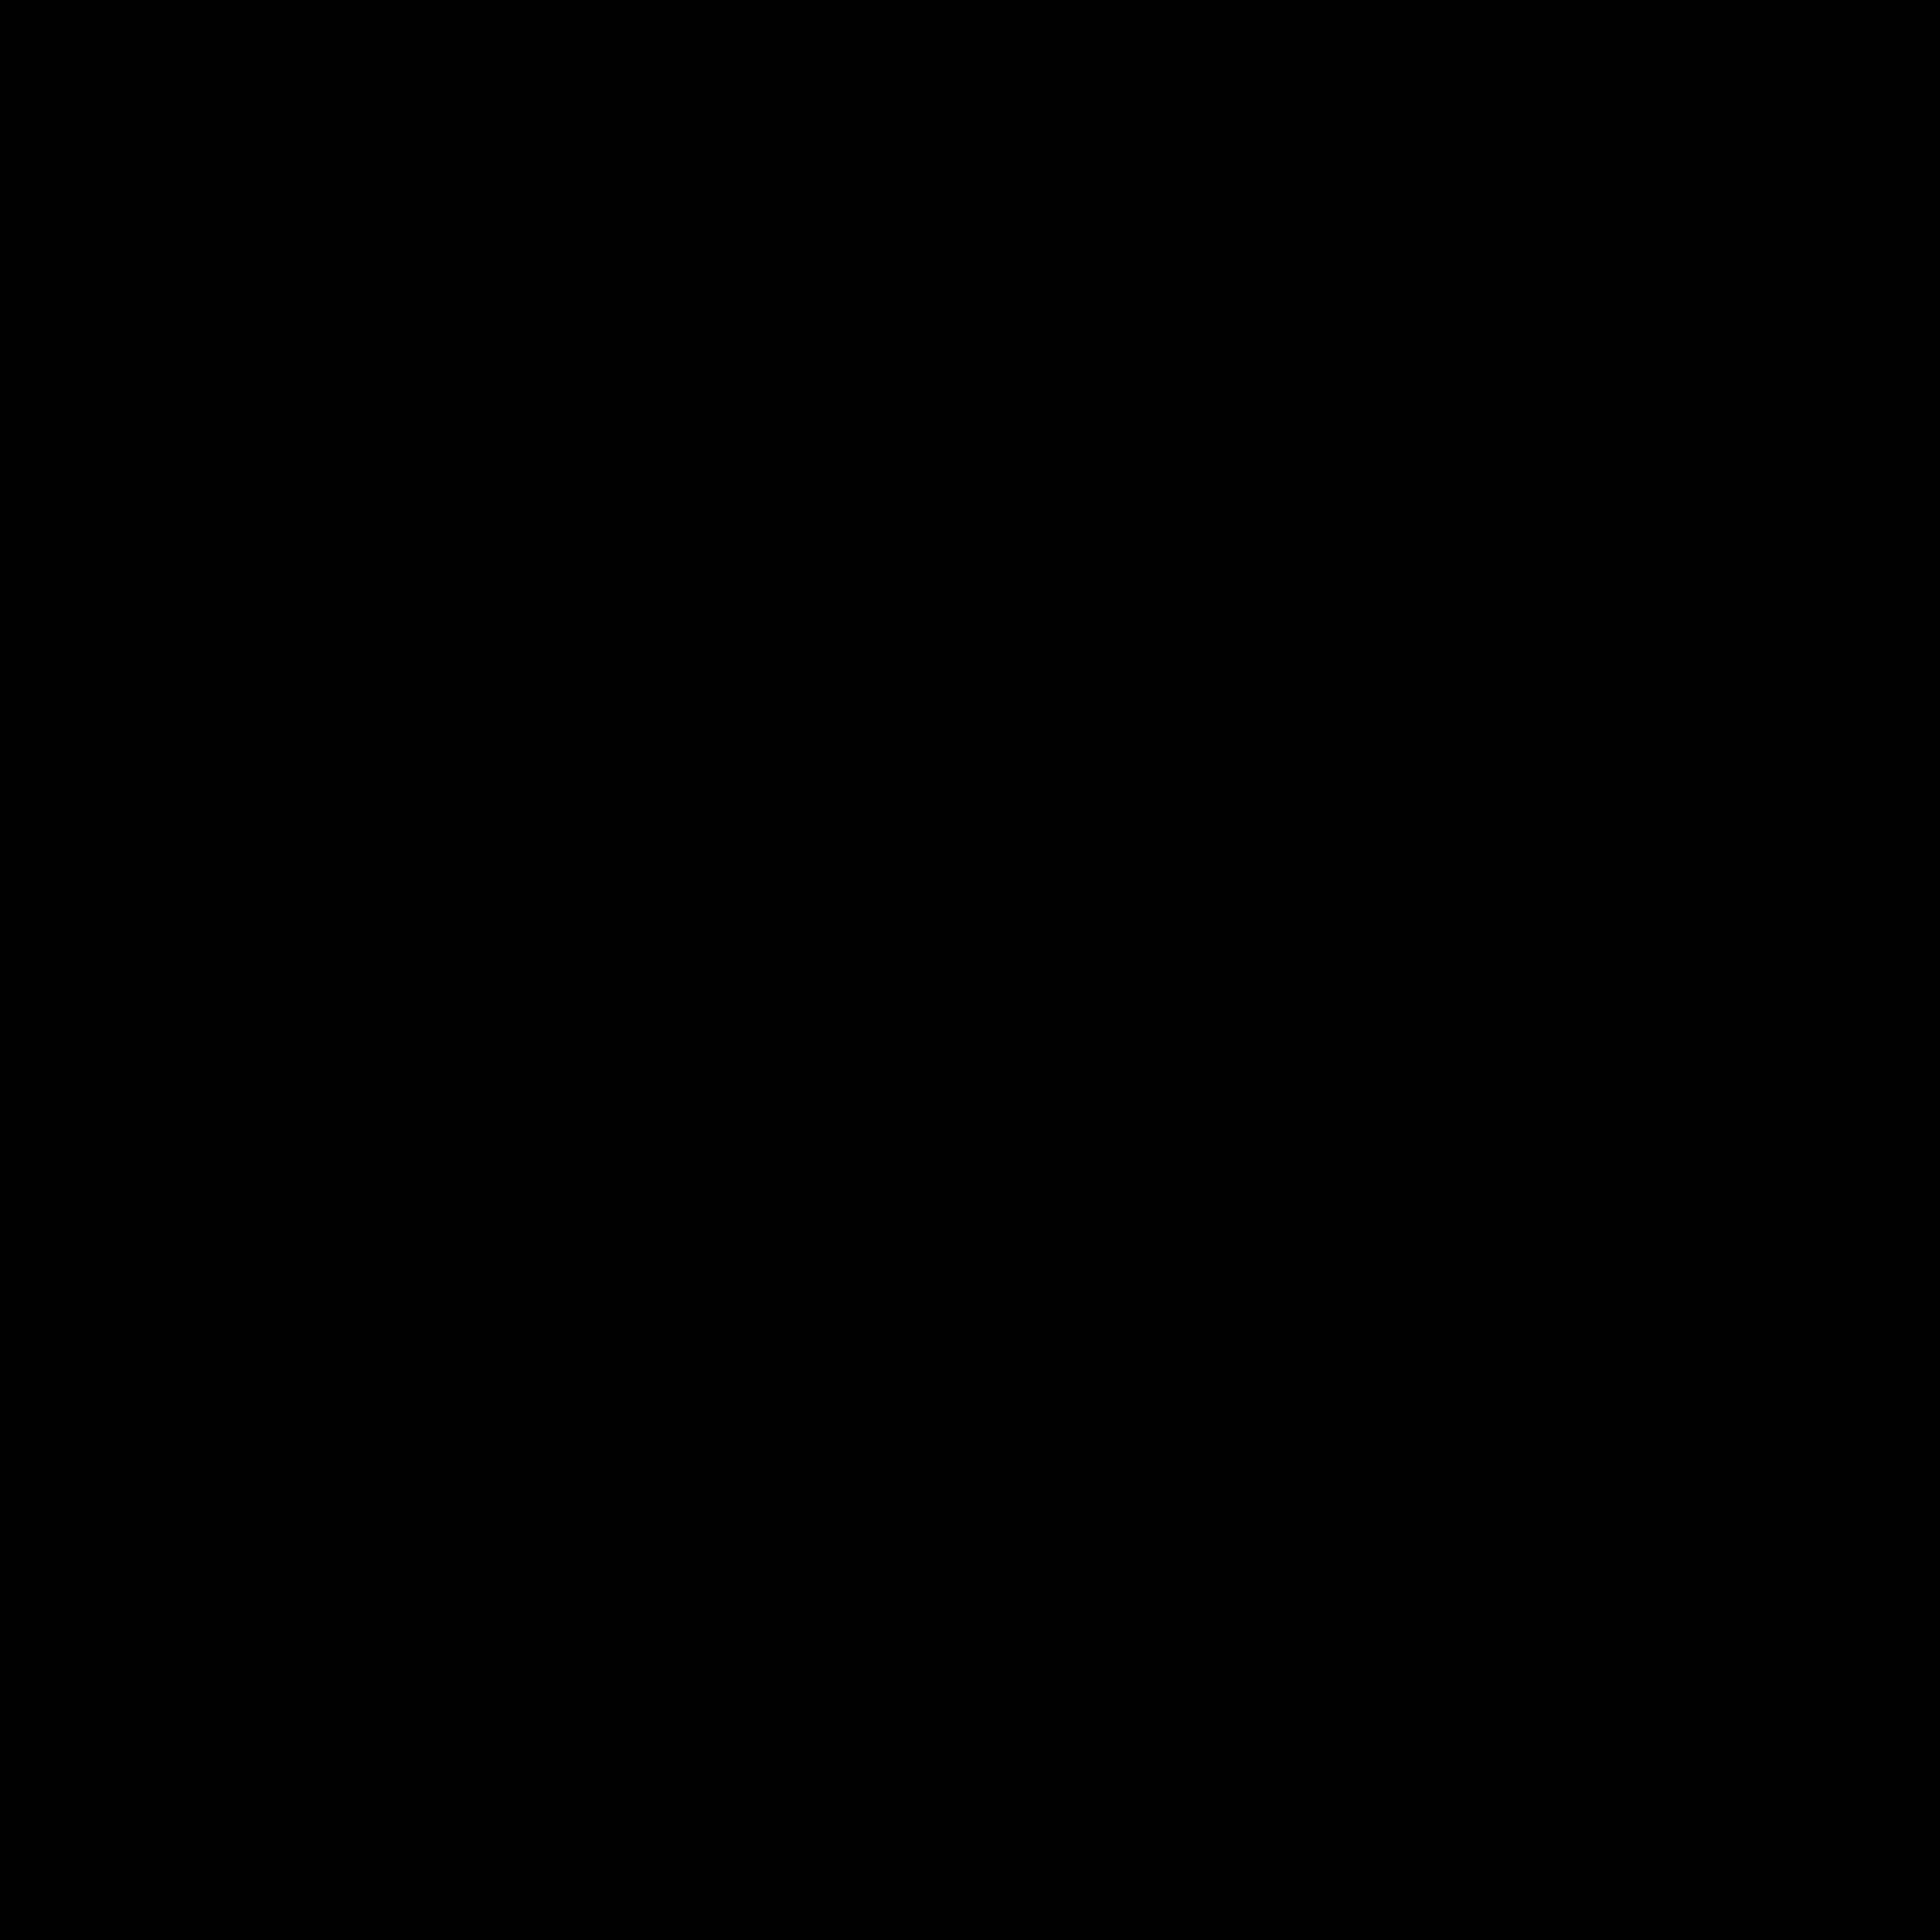 avon-5-logo-png-transparent.png